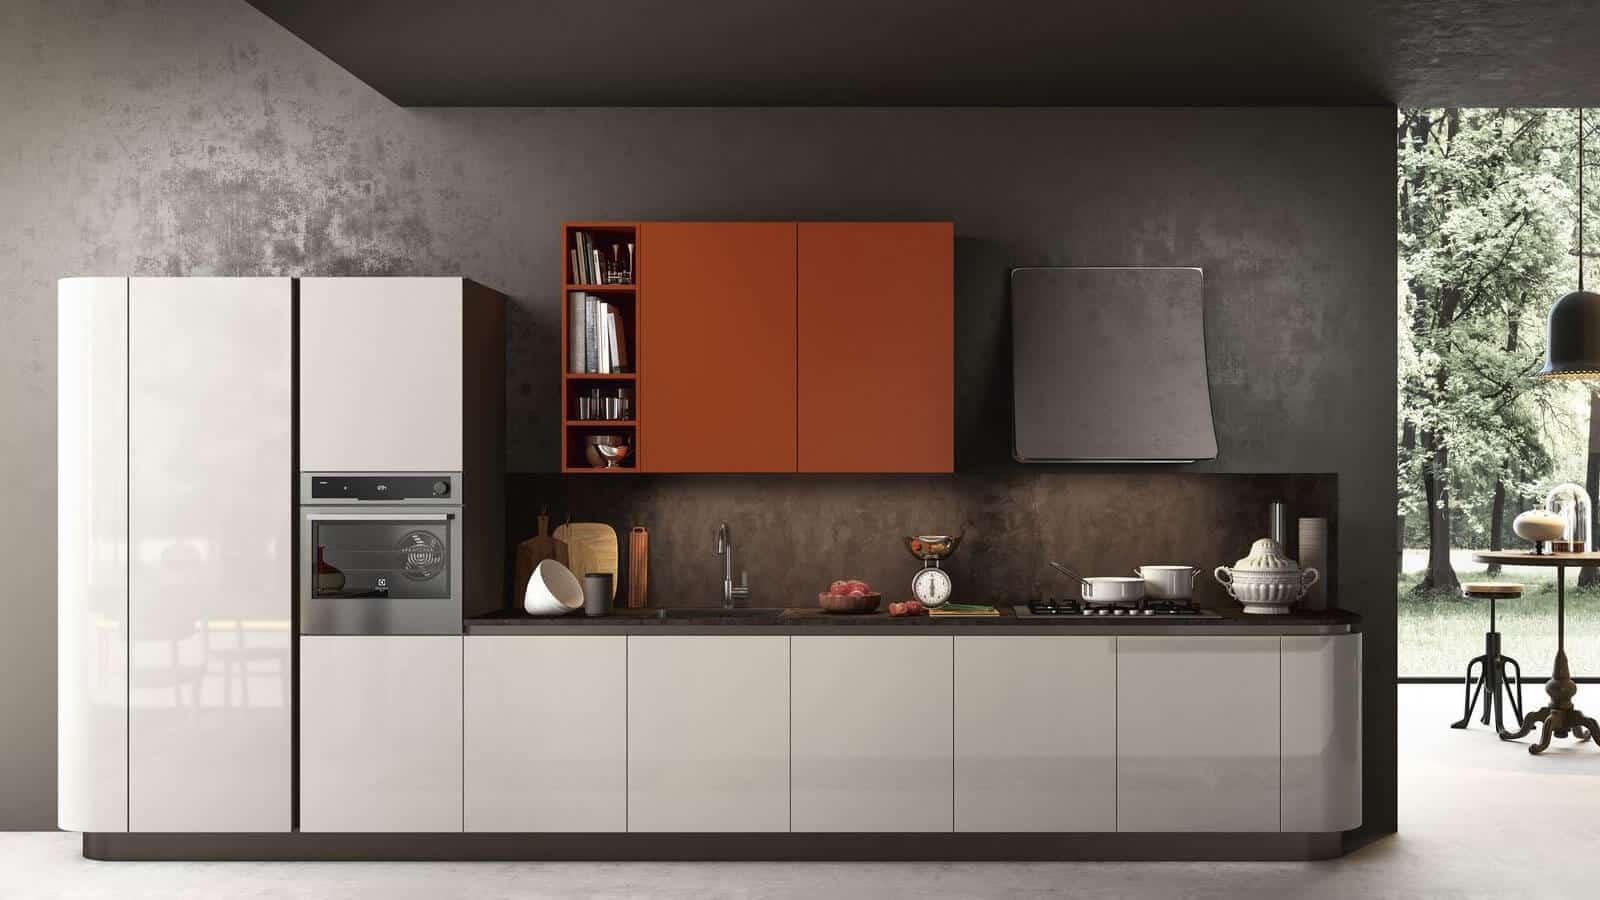 Meuble De Cuisine Arrondi cuisine arrondie   optimal cuisines & intérieurs   annecy